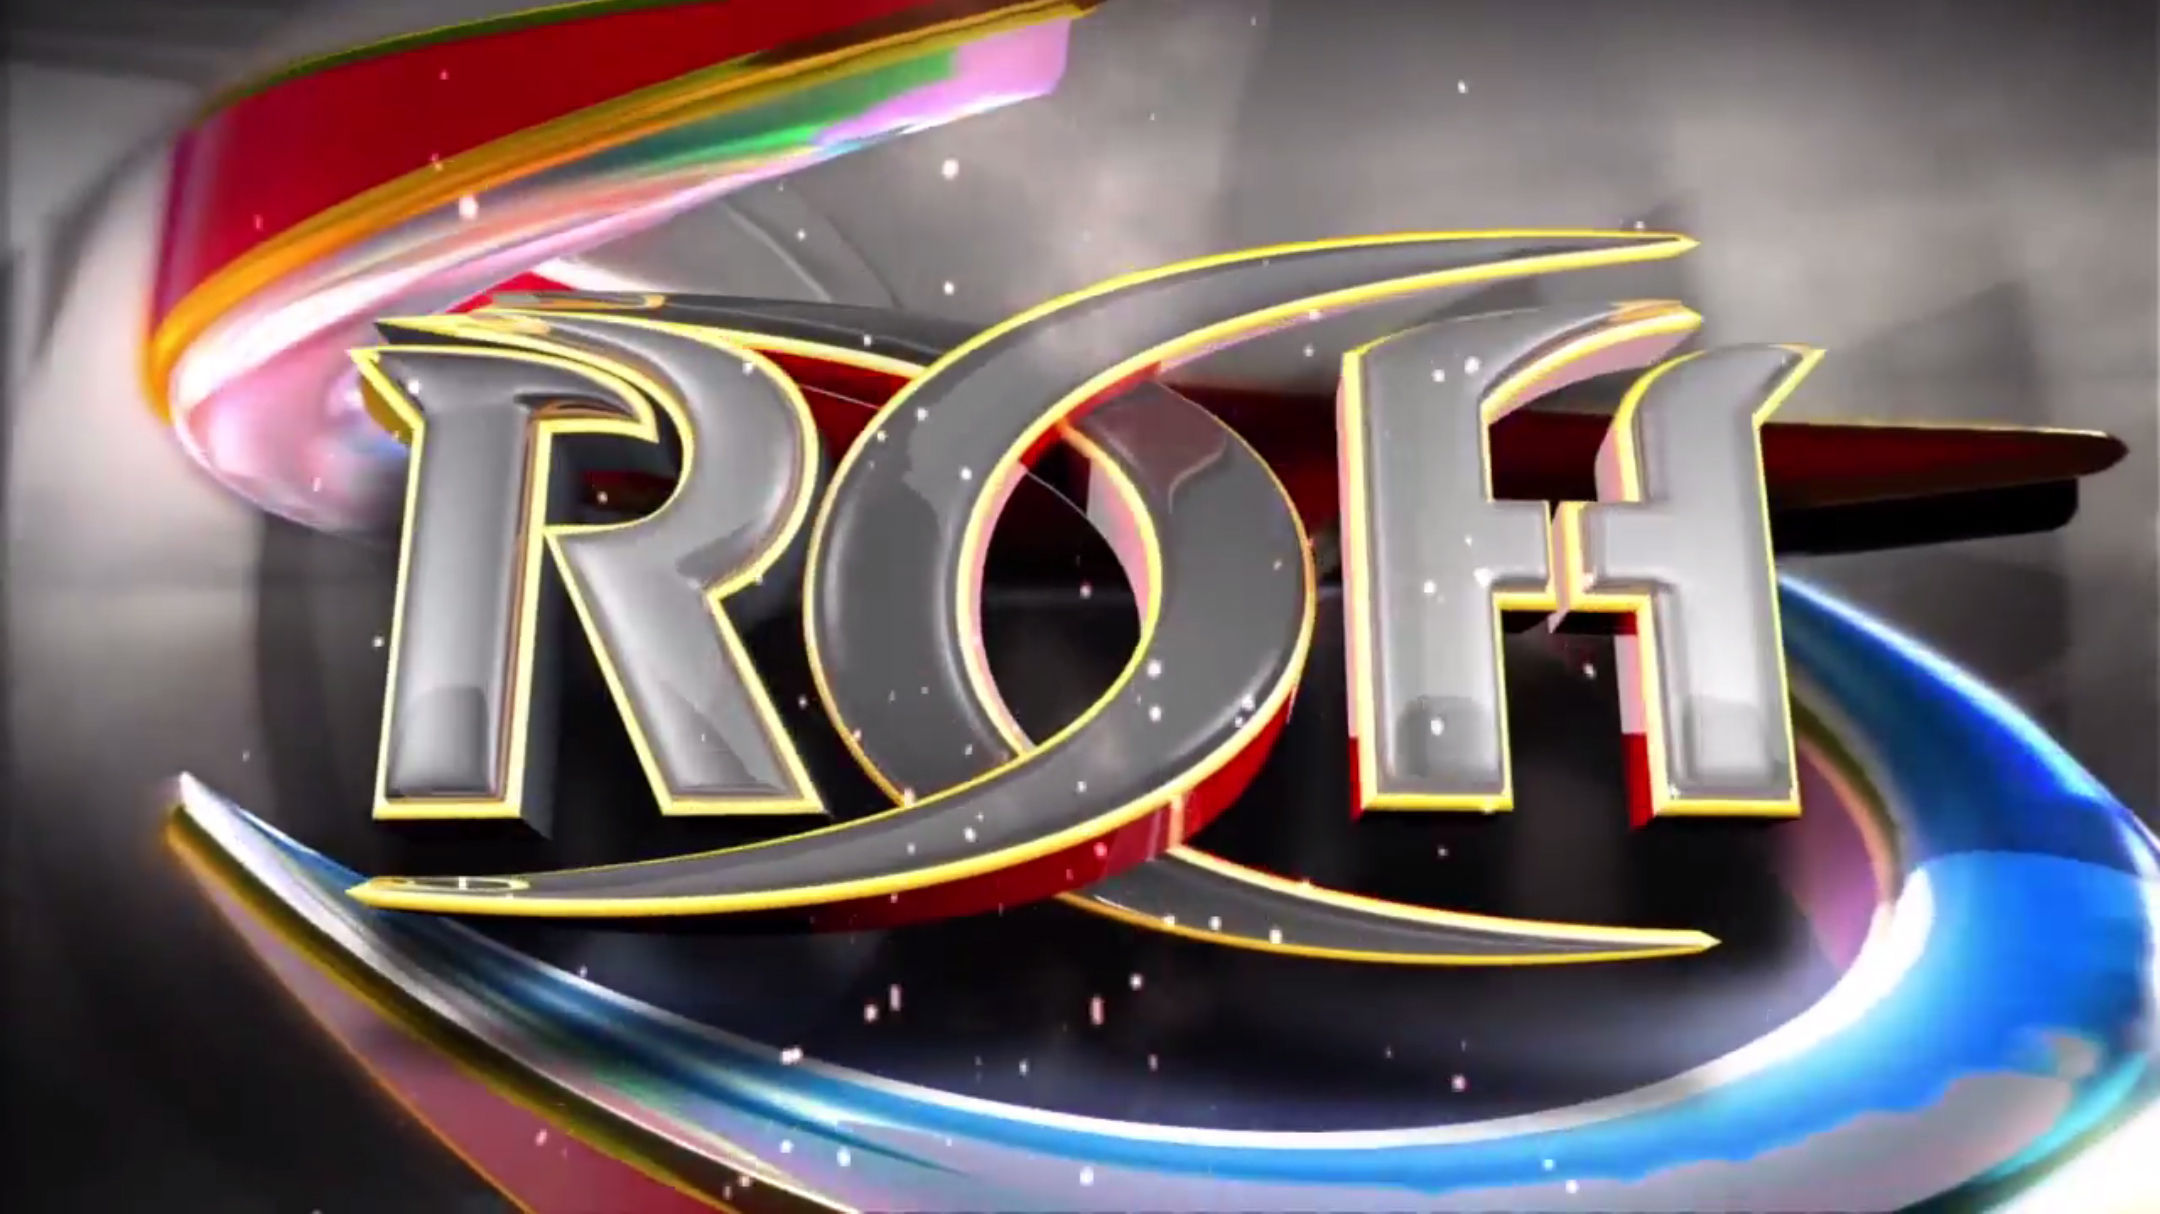 ¿Qué Significa ROH?